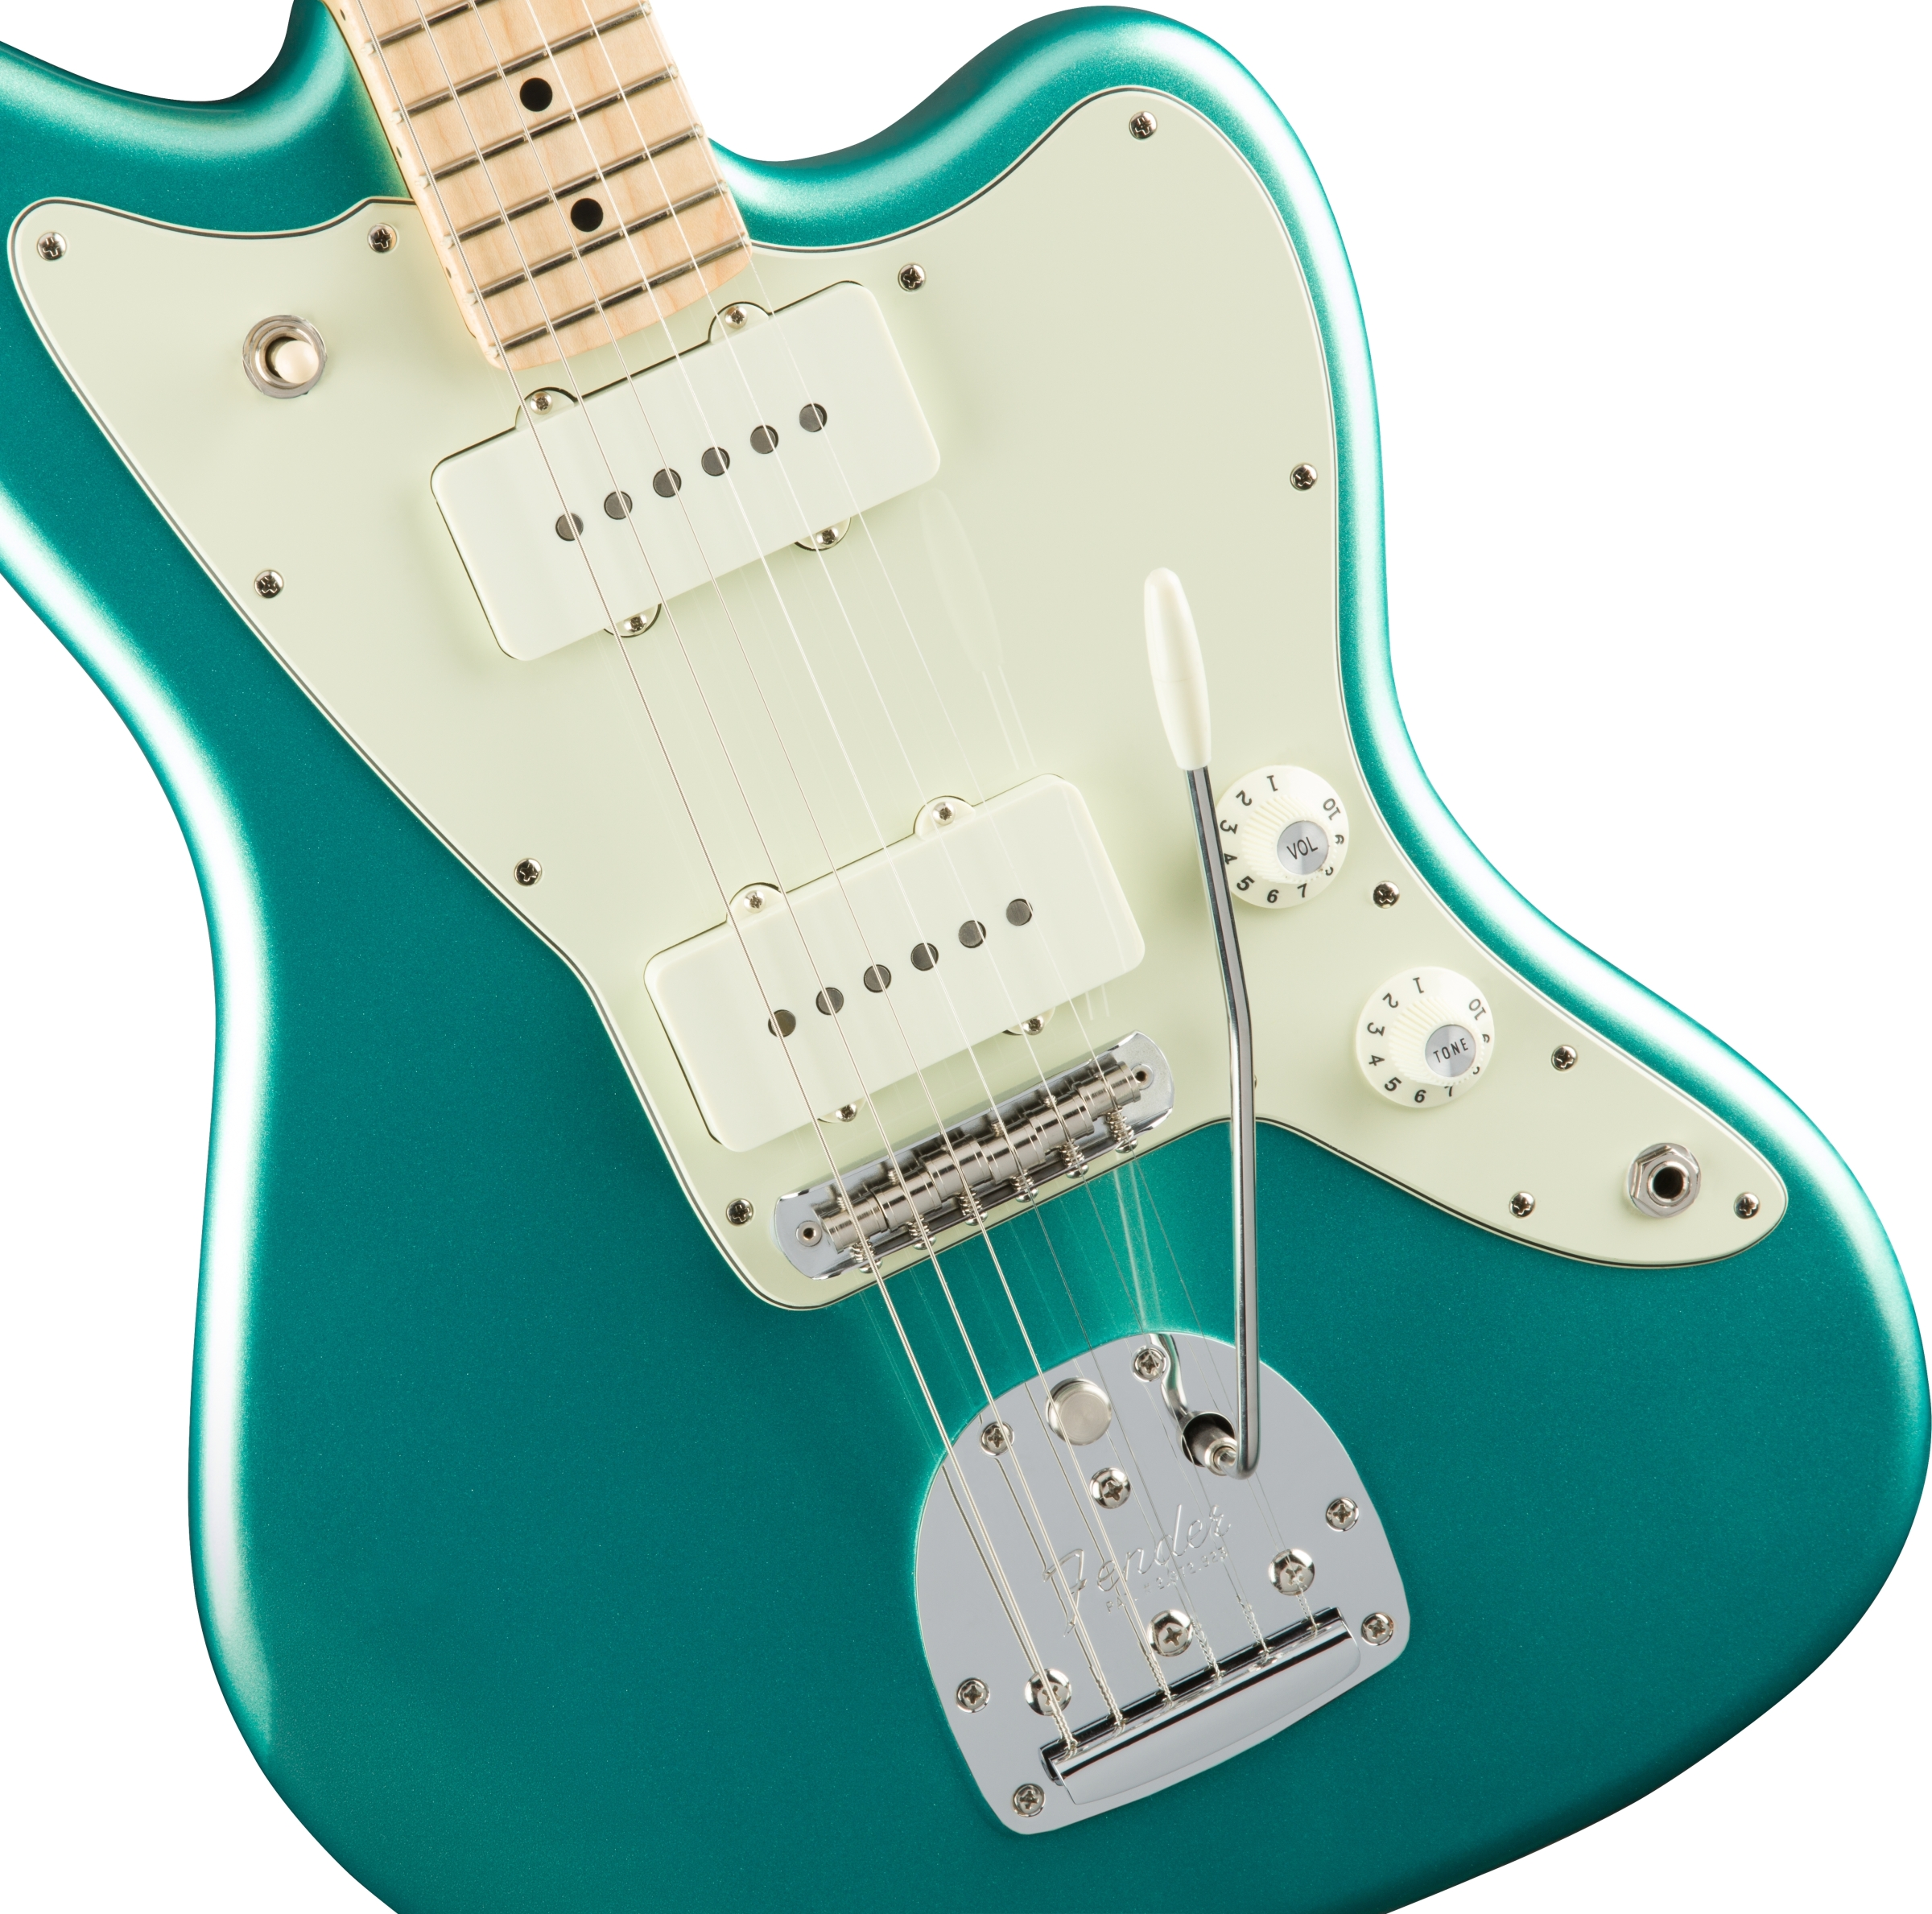 Fender American Professional Jazzmaster Wiring Diagram Great Guitar Electric Guitars Rh Shop Com Schematic